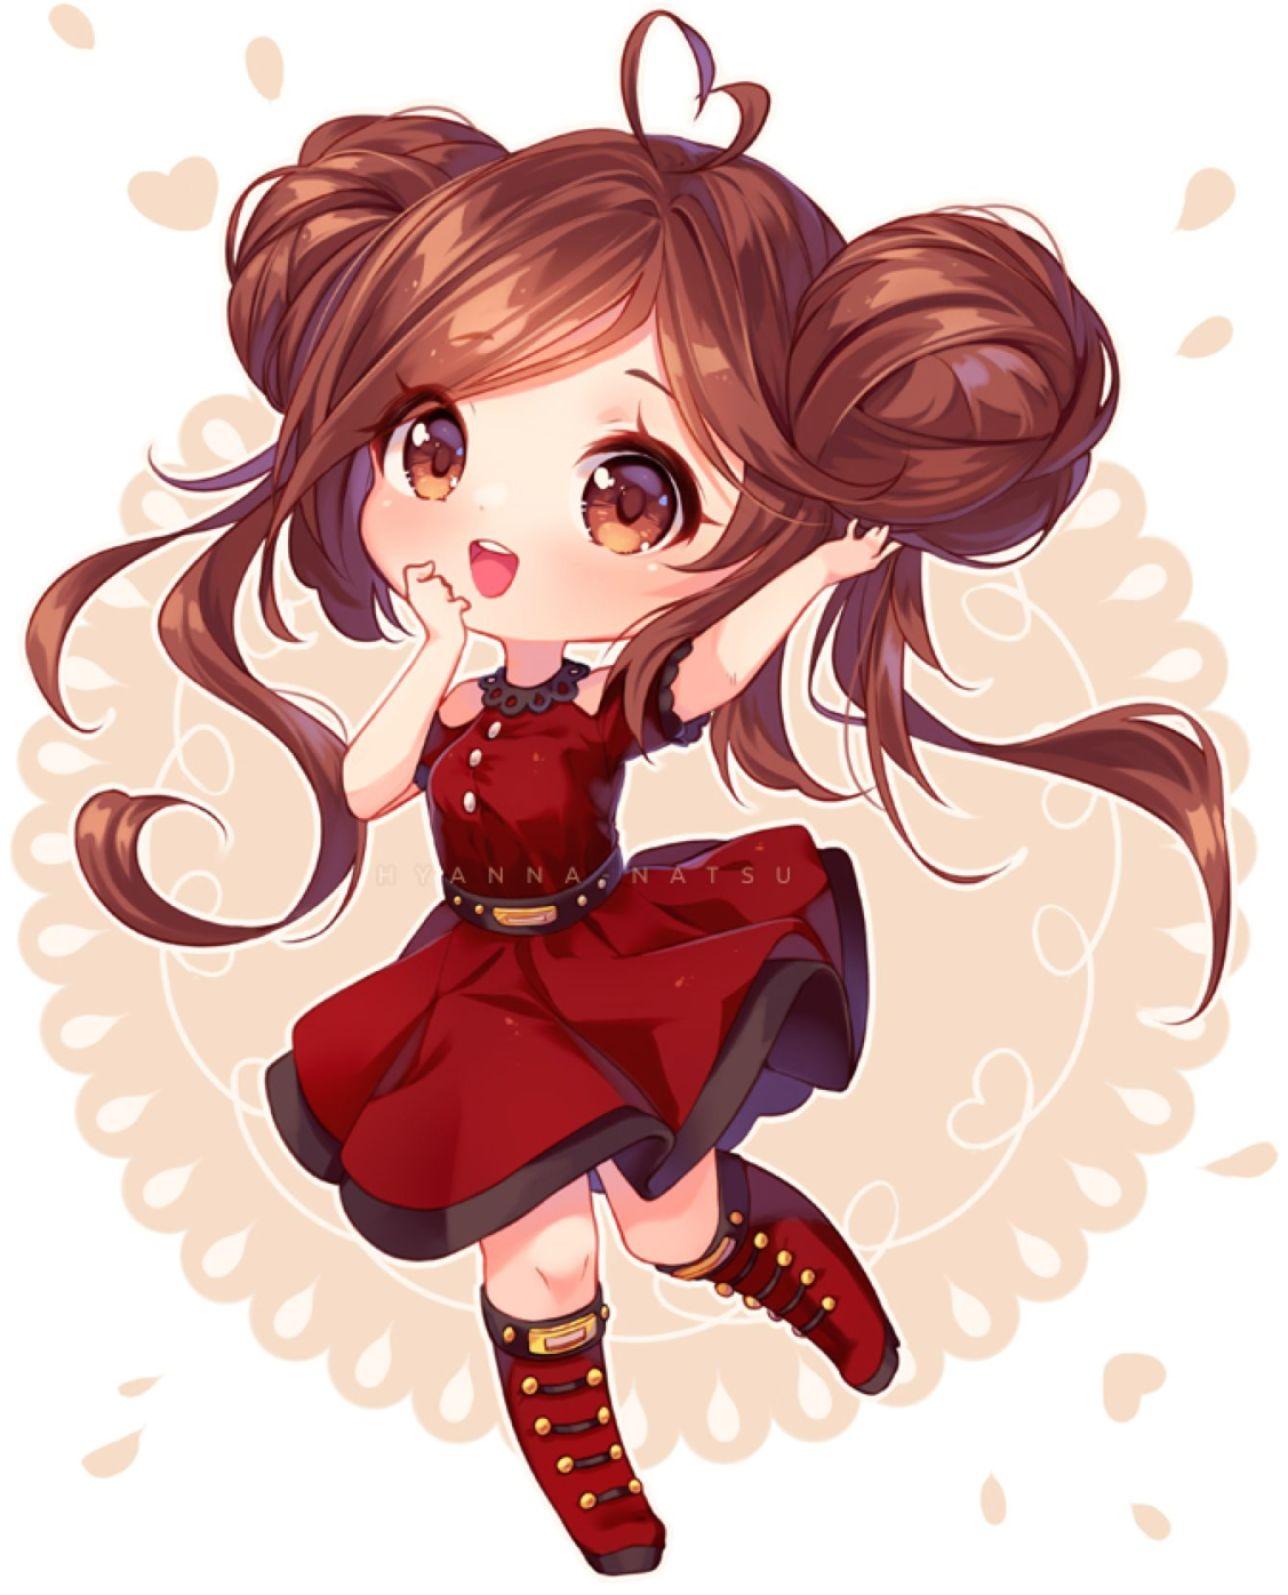 Anime Chibi - Original image